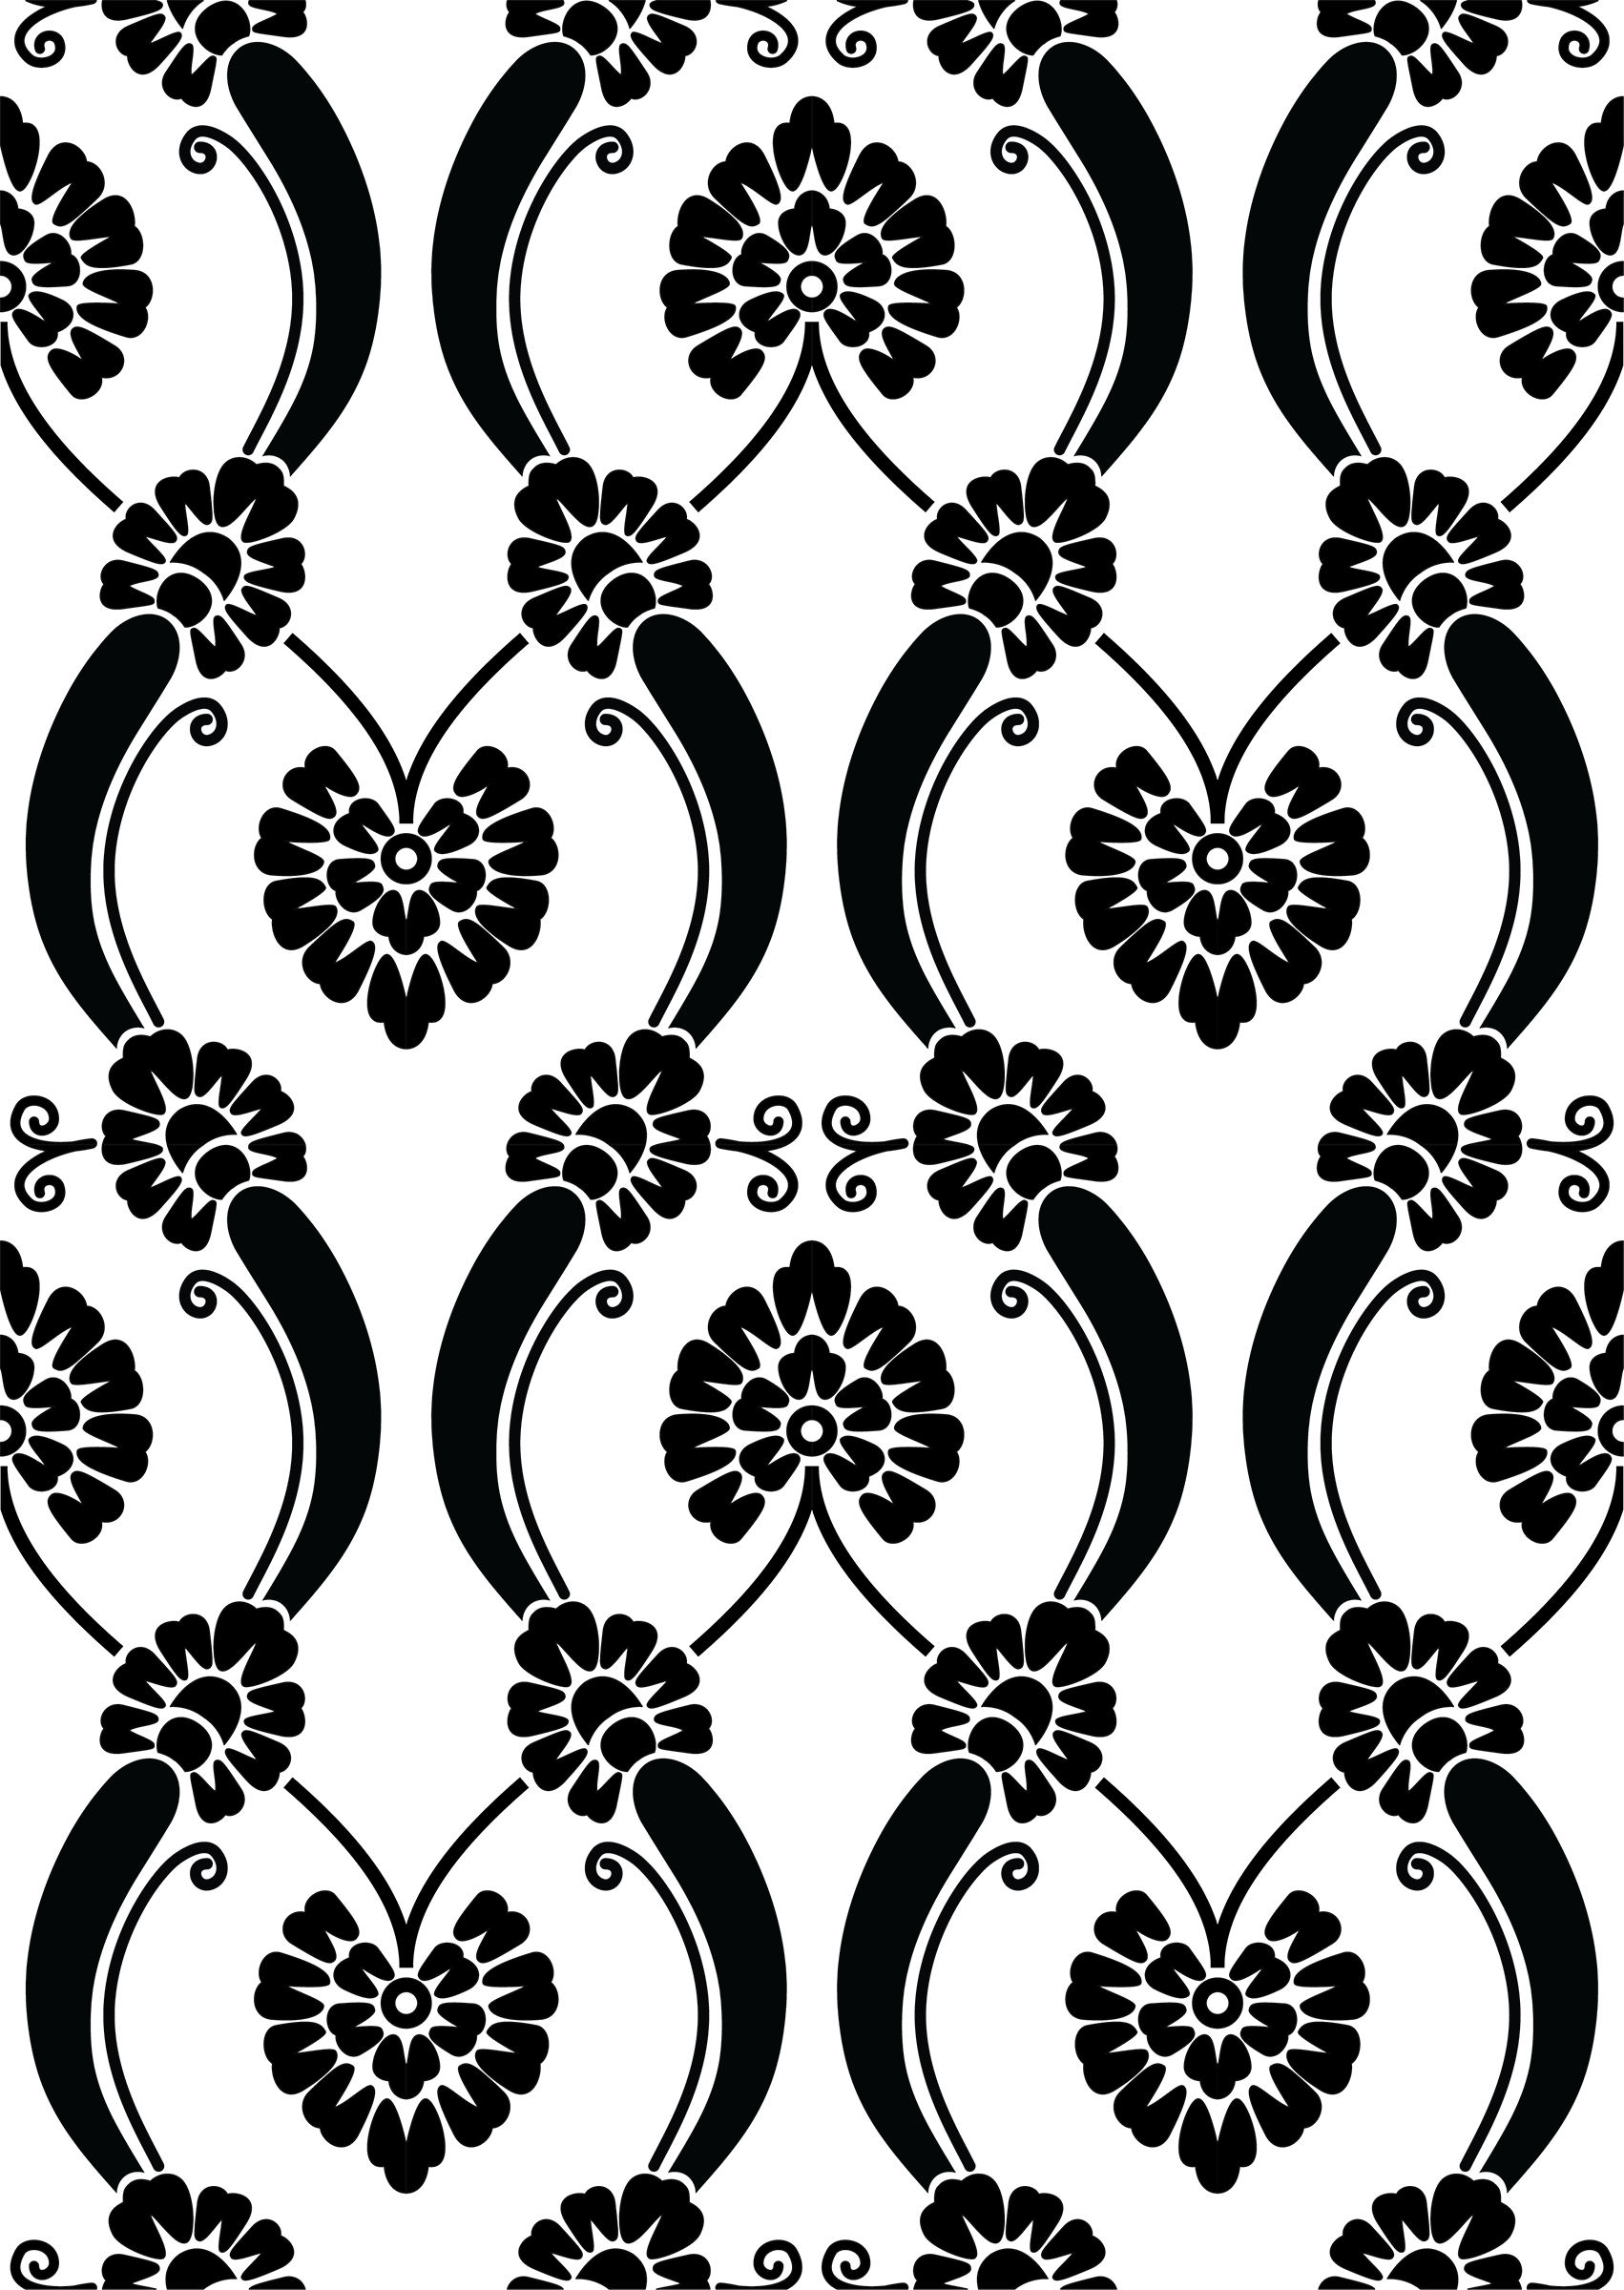 Clipart Transparent 890 88kb 1702x2400 Print Design Pattern Floral Border Design Digital Borders Design